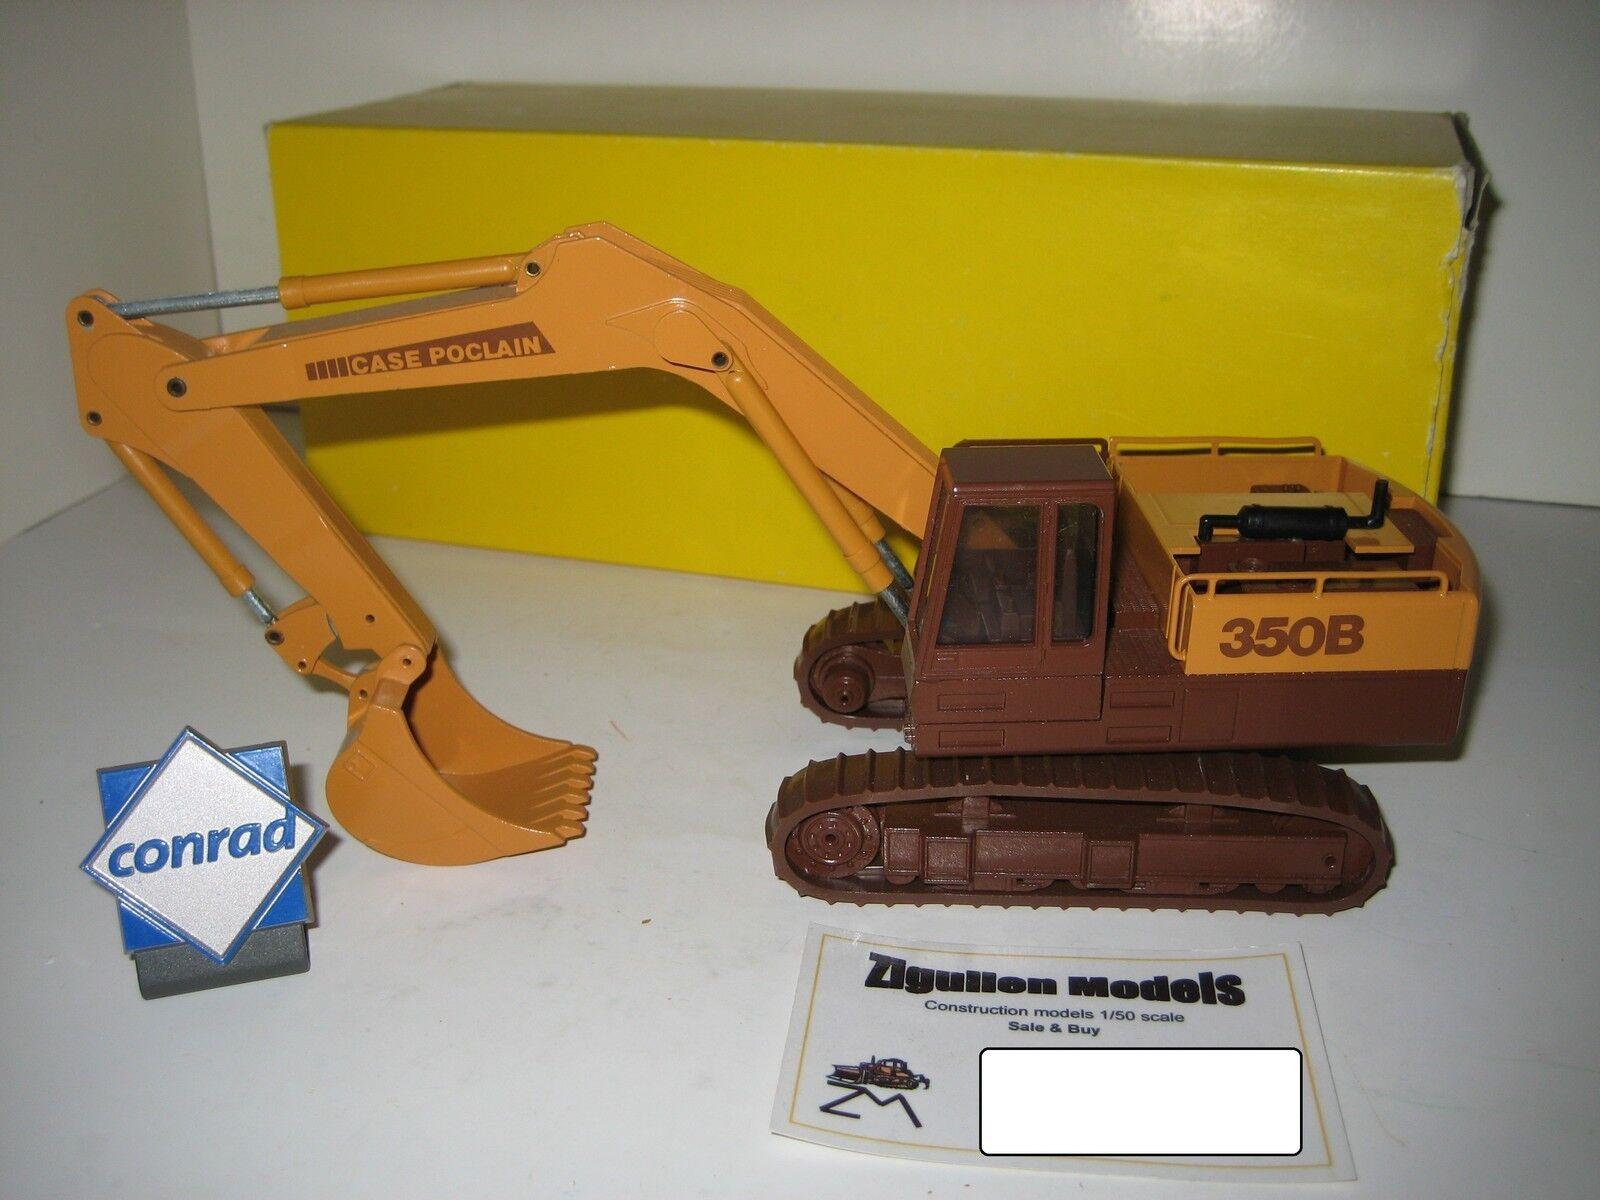 CASE POCLAIN 350 B Excavateurs tieflöffel à chenilles #2891.5 CONRAD 1:50 NEUF dans sa boîte   Stocker